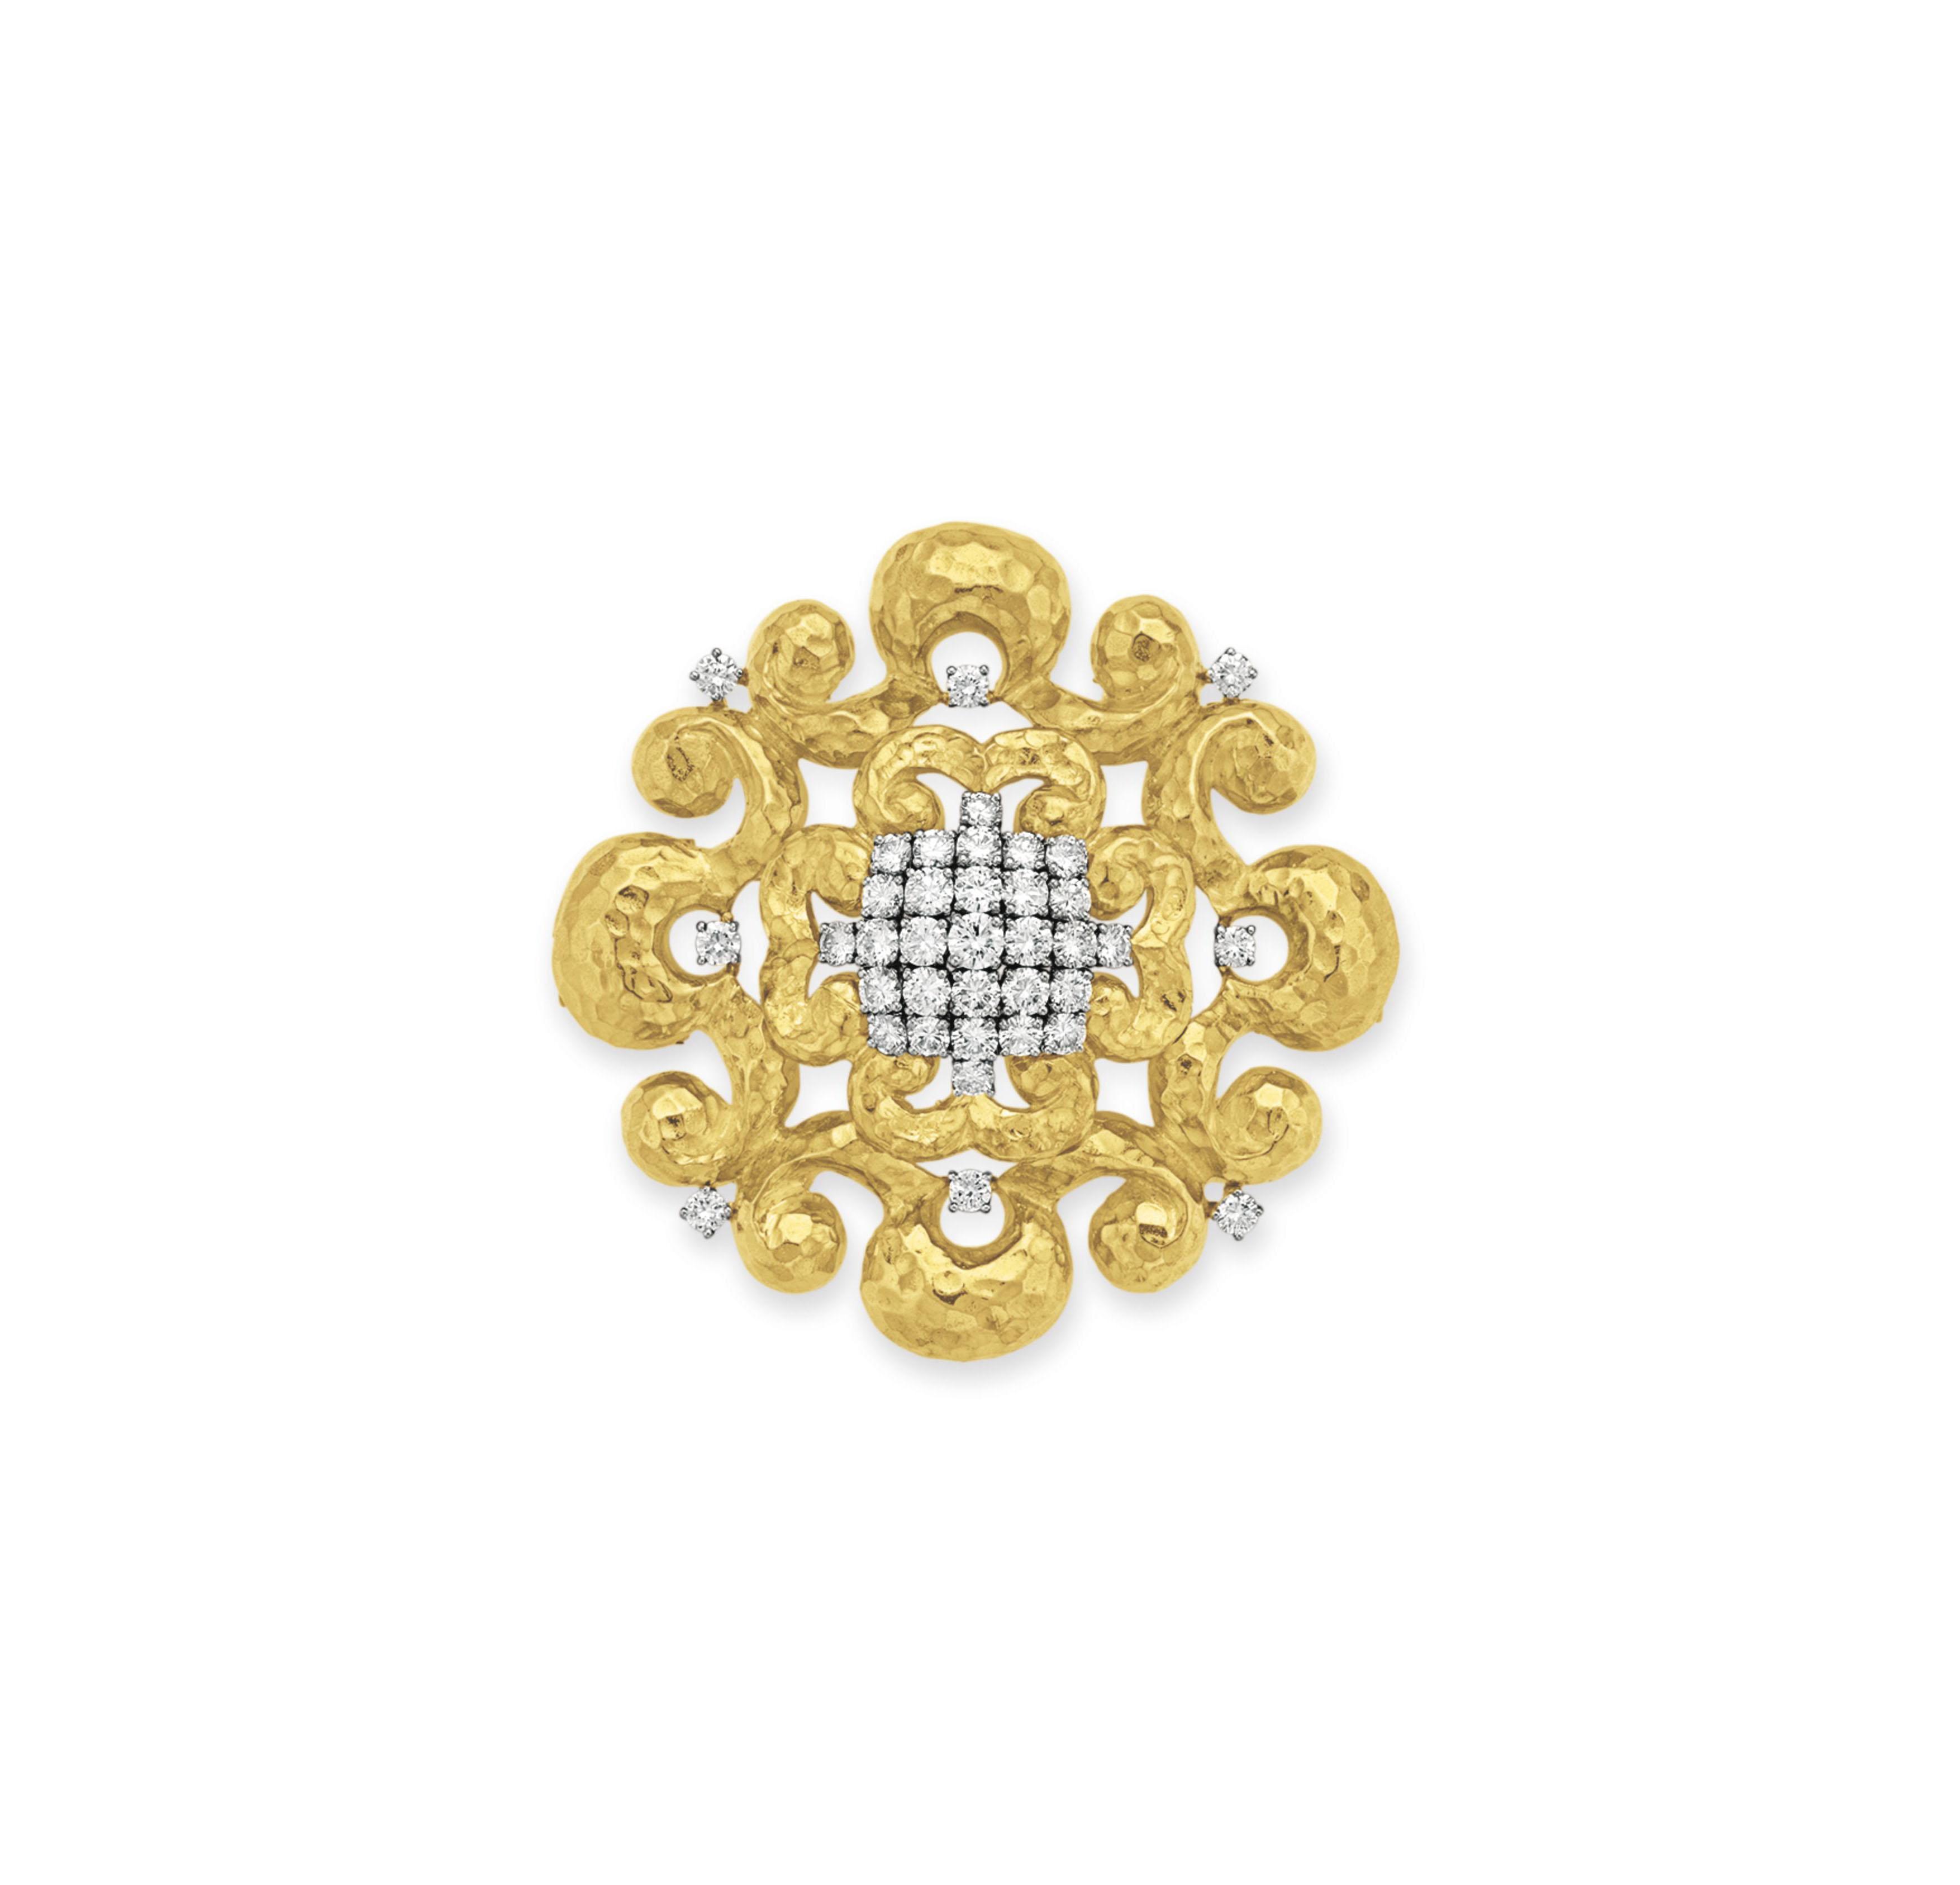 A DIAMOND AND GOLD PENDANT BRO